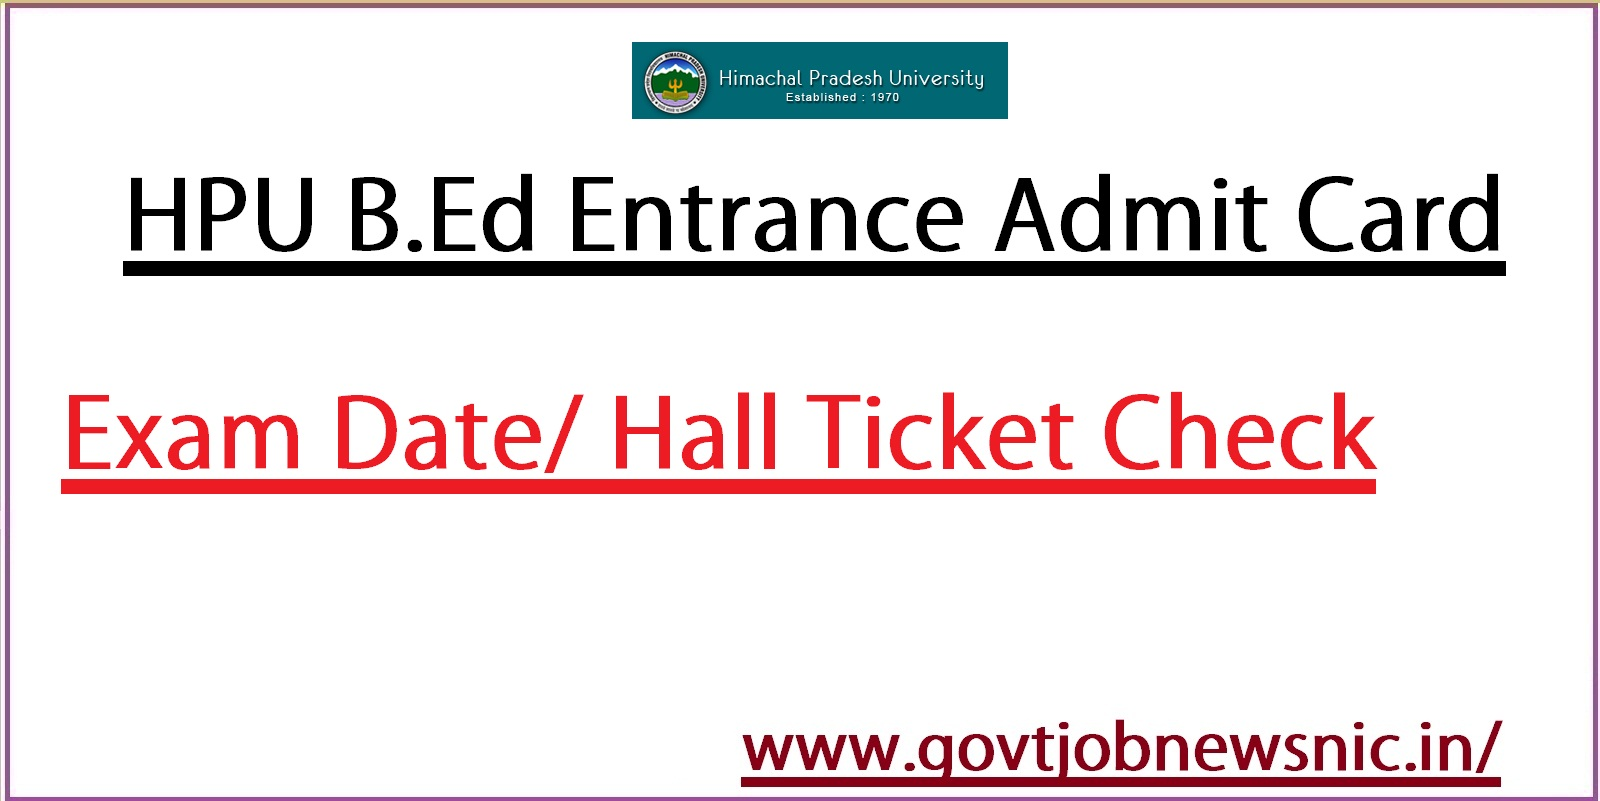 HPU B.Ed Admit Card 2021